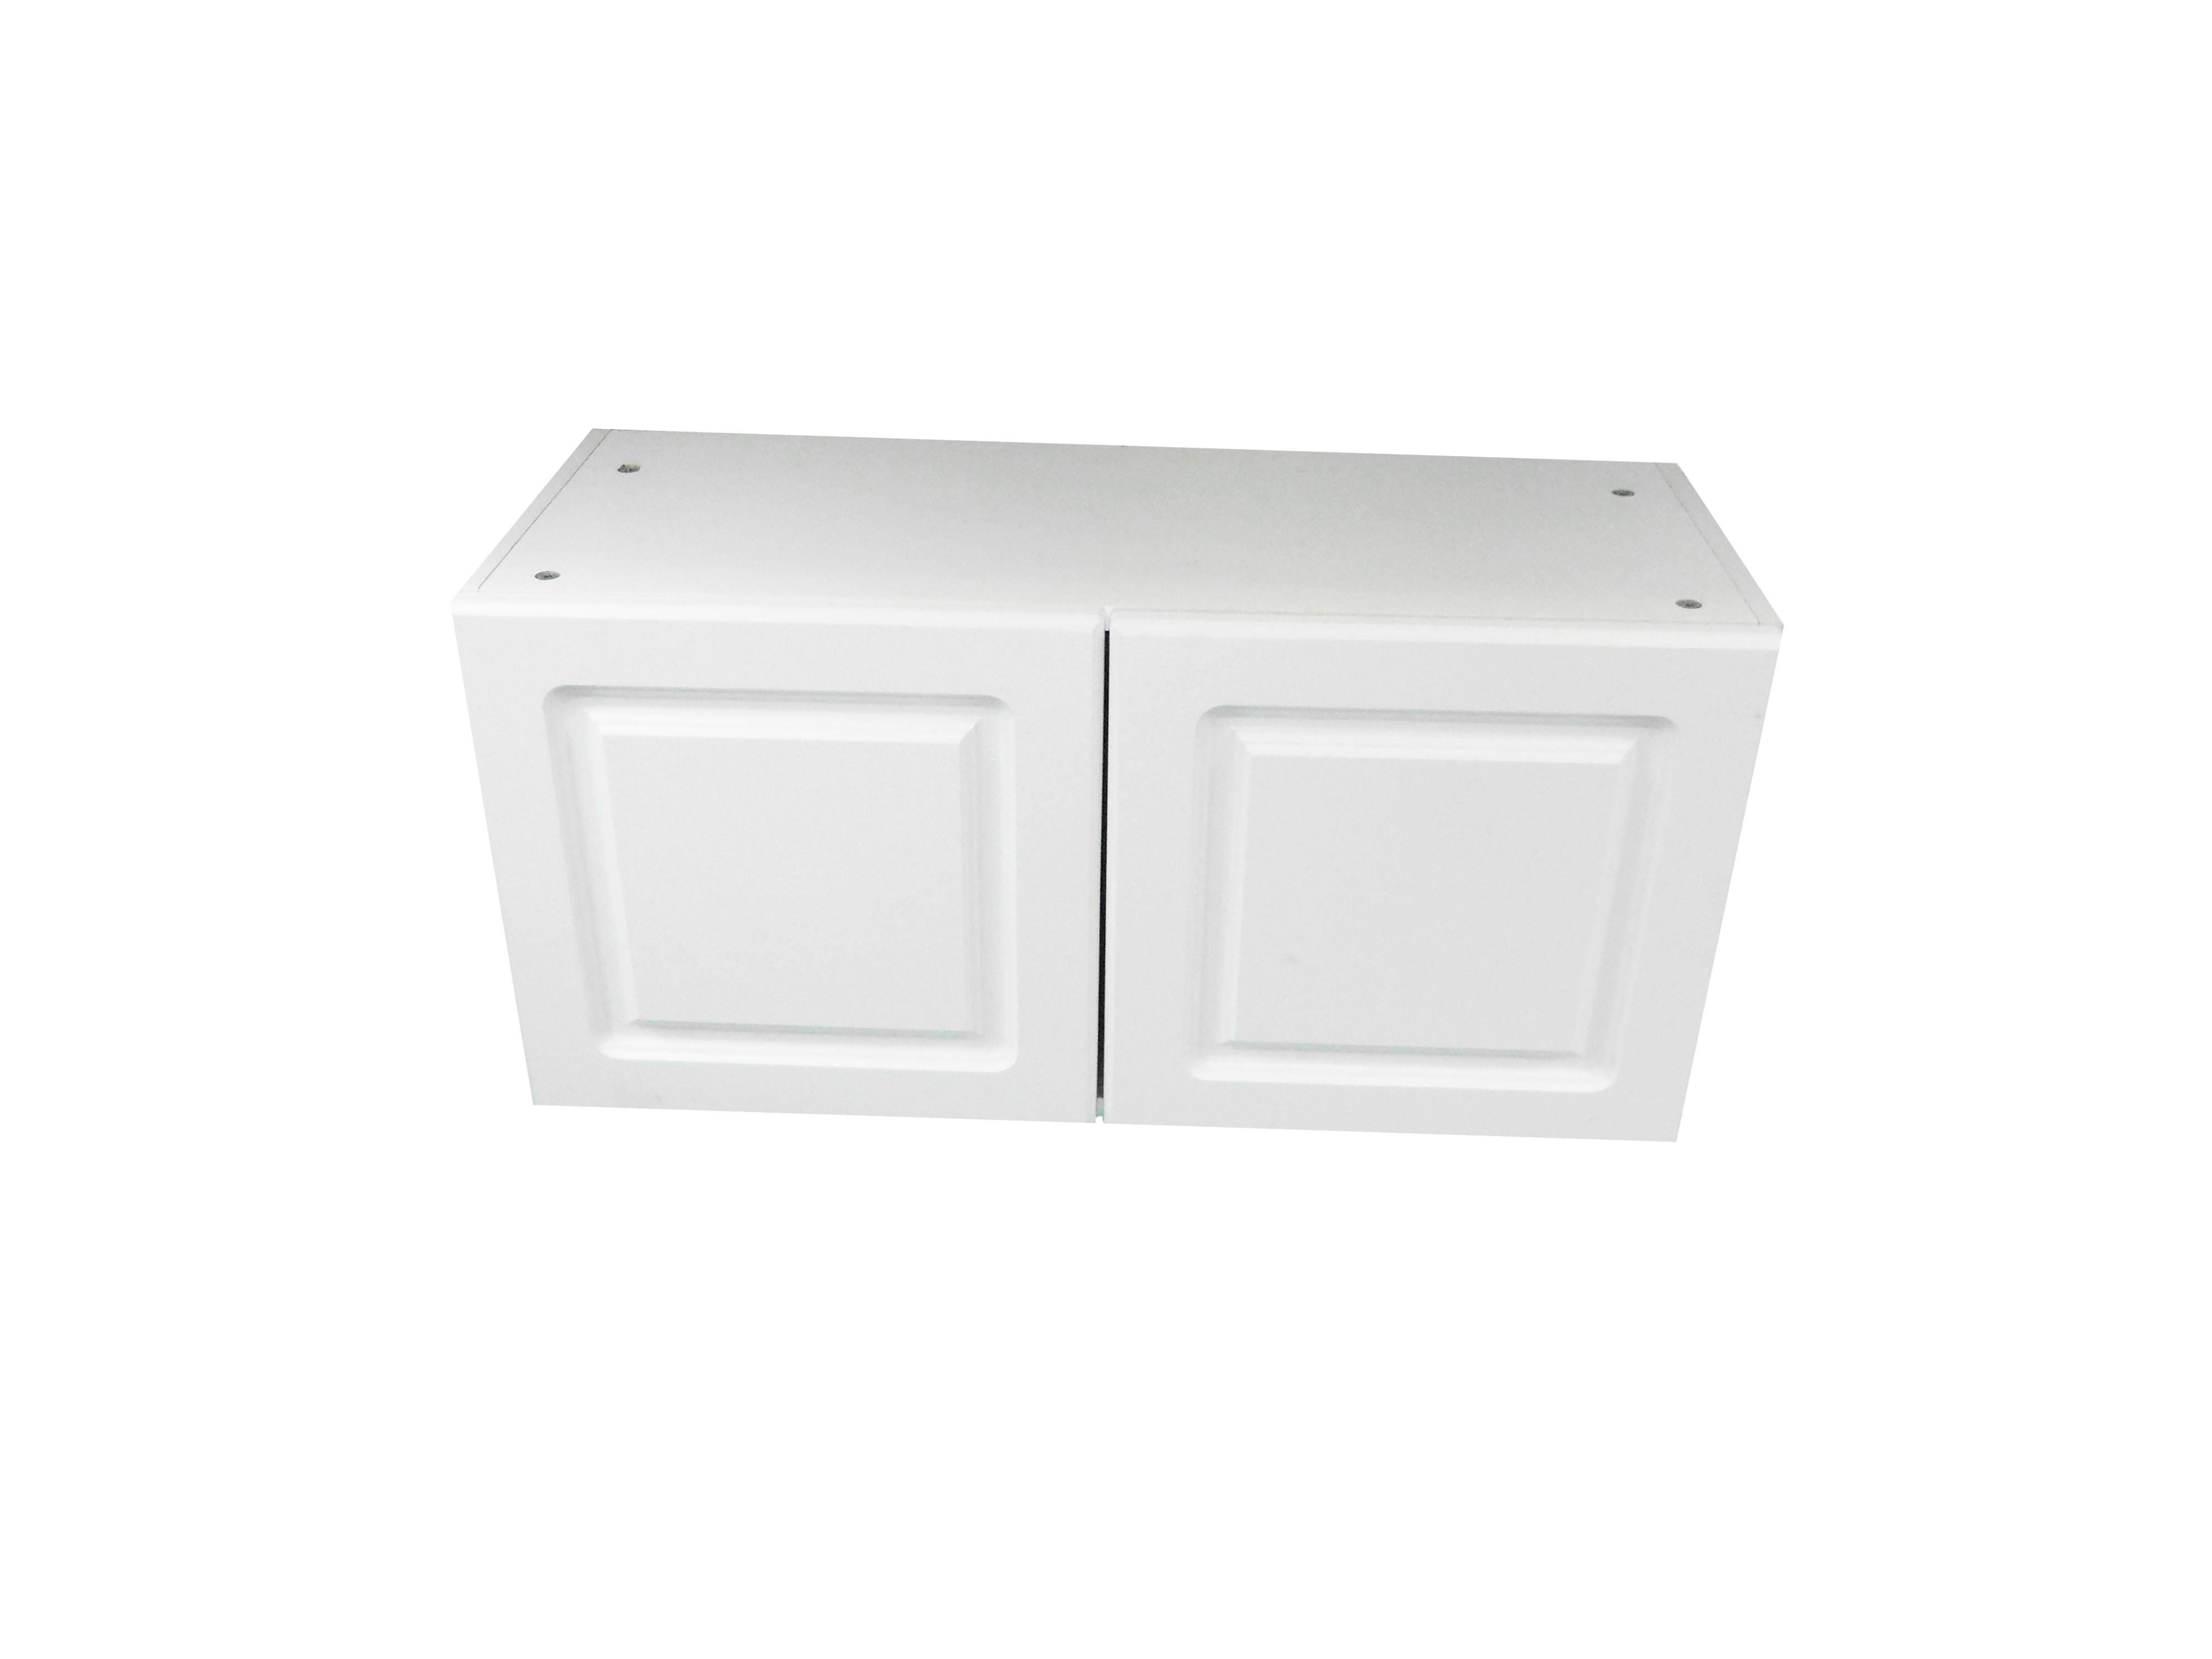 Appliance Wall Cabinet with 2 Doors / San Juan / Raised Panel White / 33x15 San Juan 0